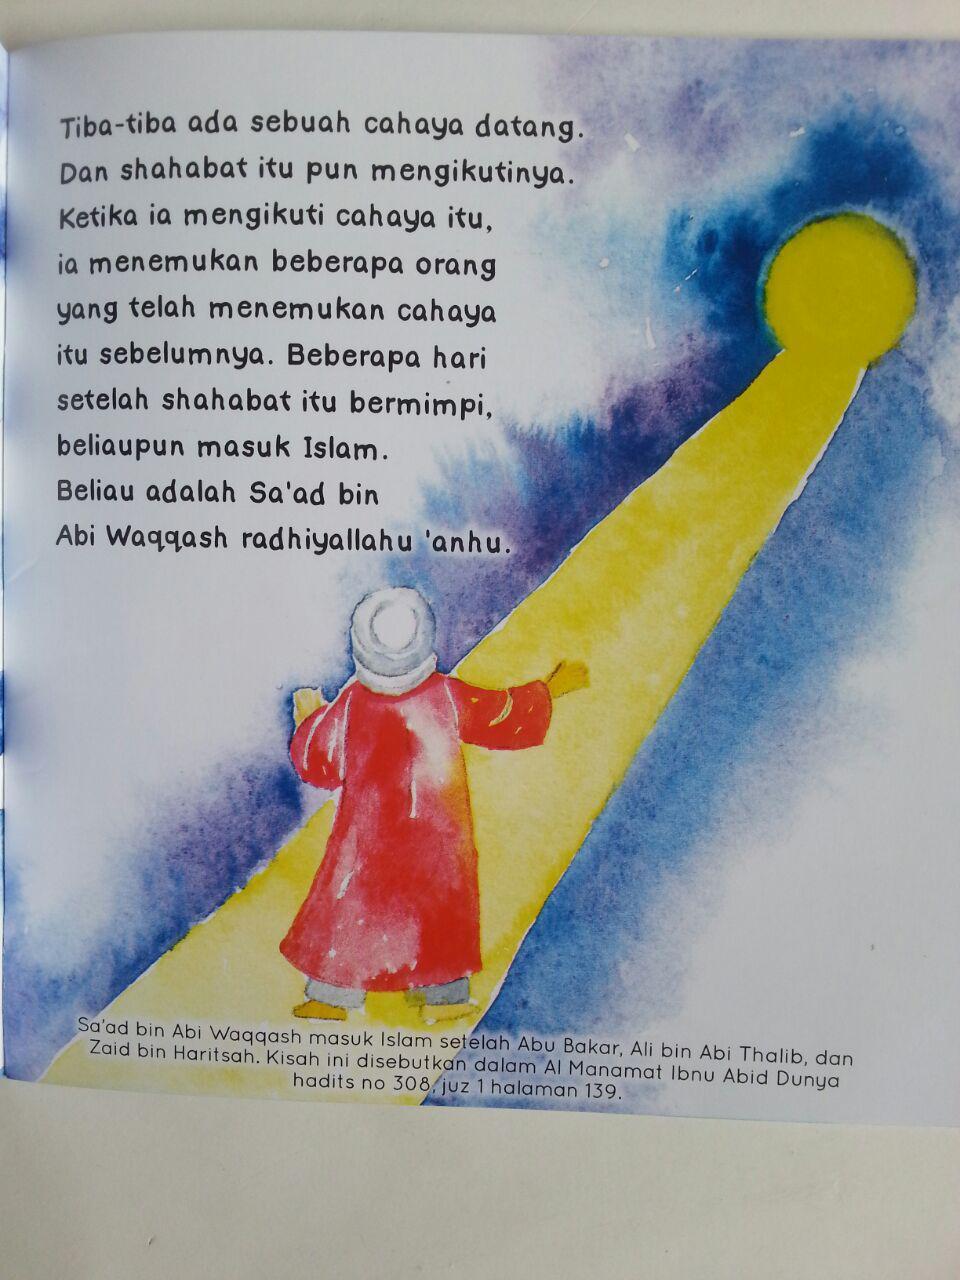 Buku Anak Ushul Tsalatsah For Kids Mengenal Islam isi